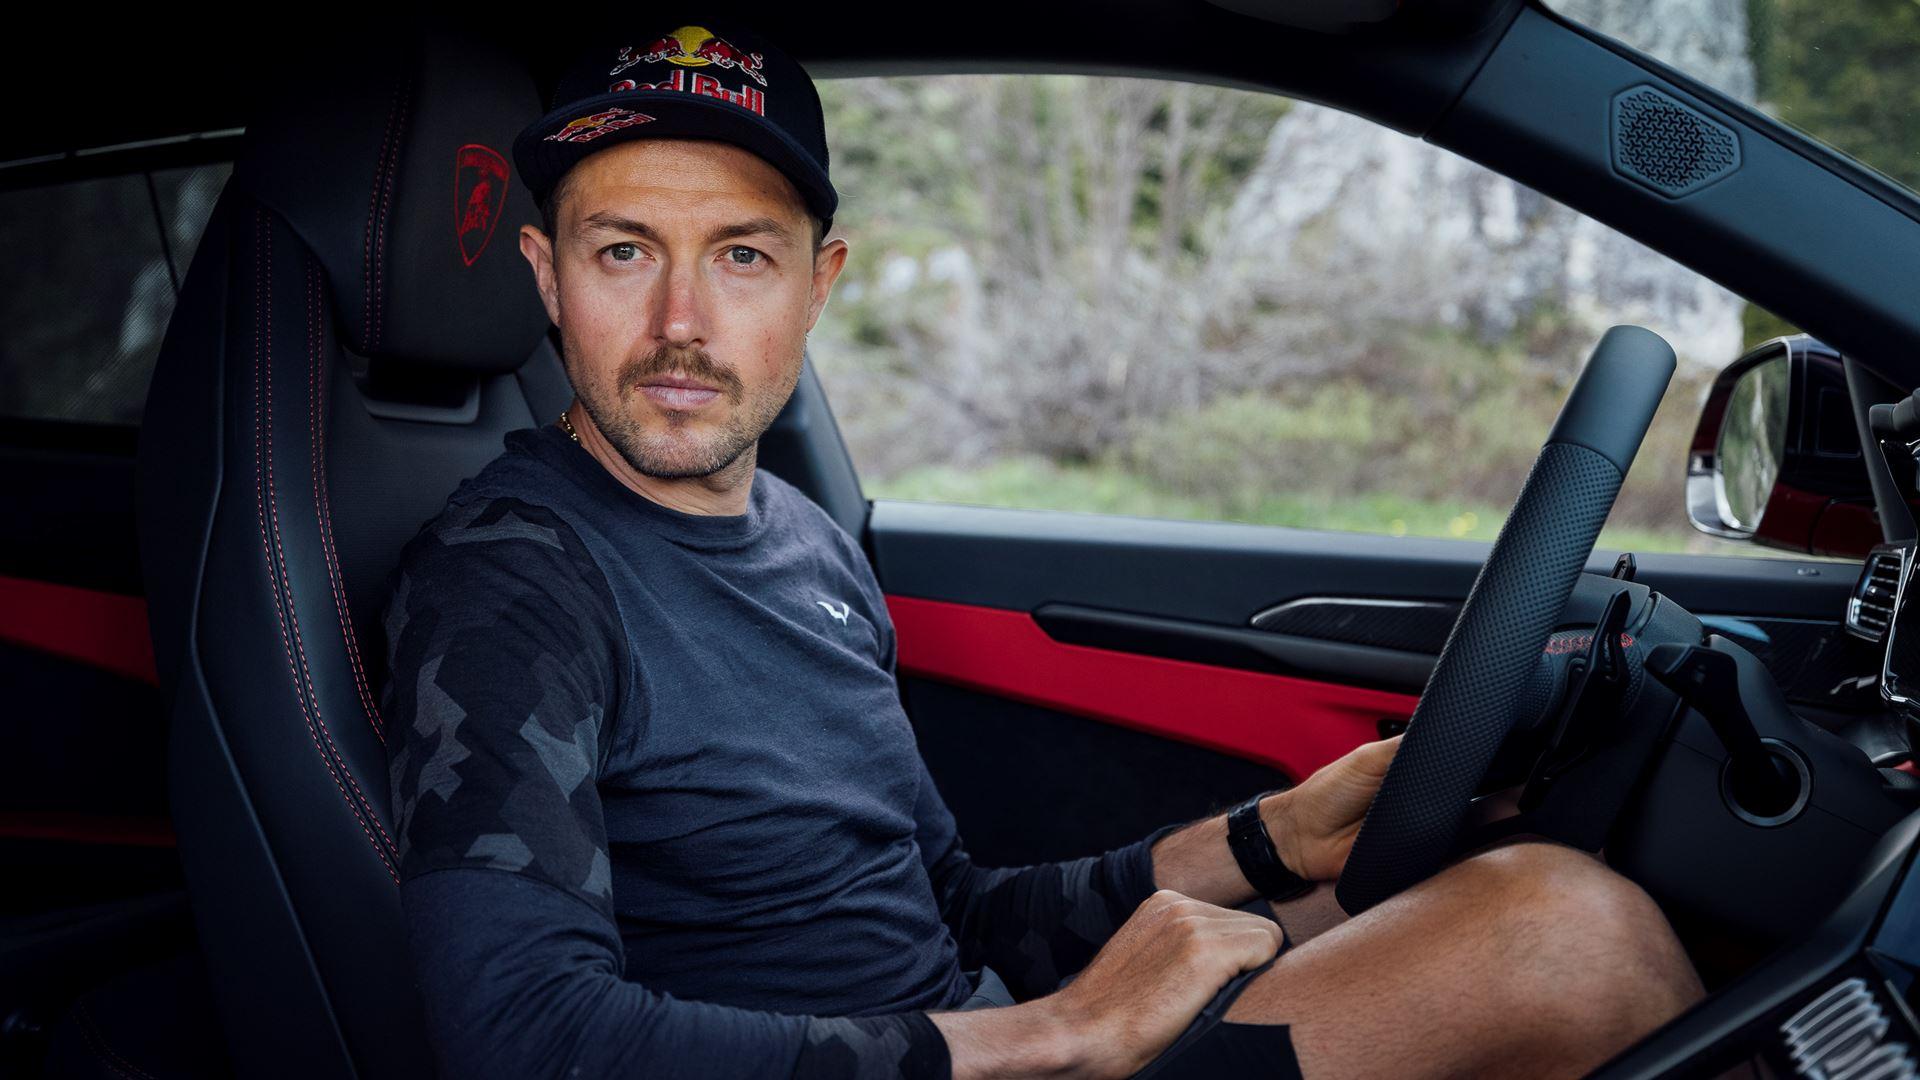 Lamborghini Urus and Aaron Durogati together for an extraordinary feat - Image 5